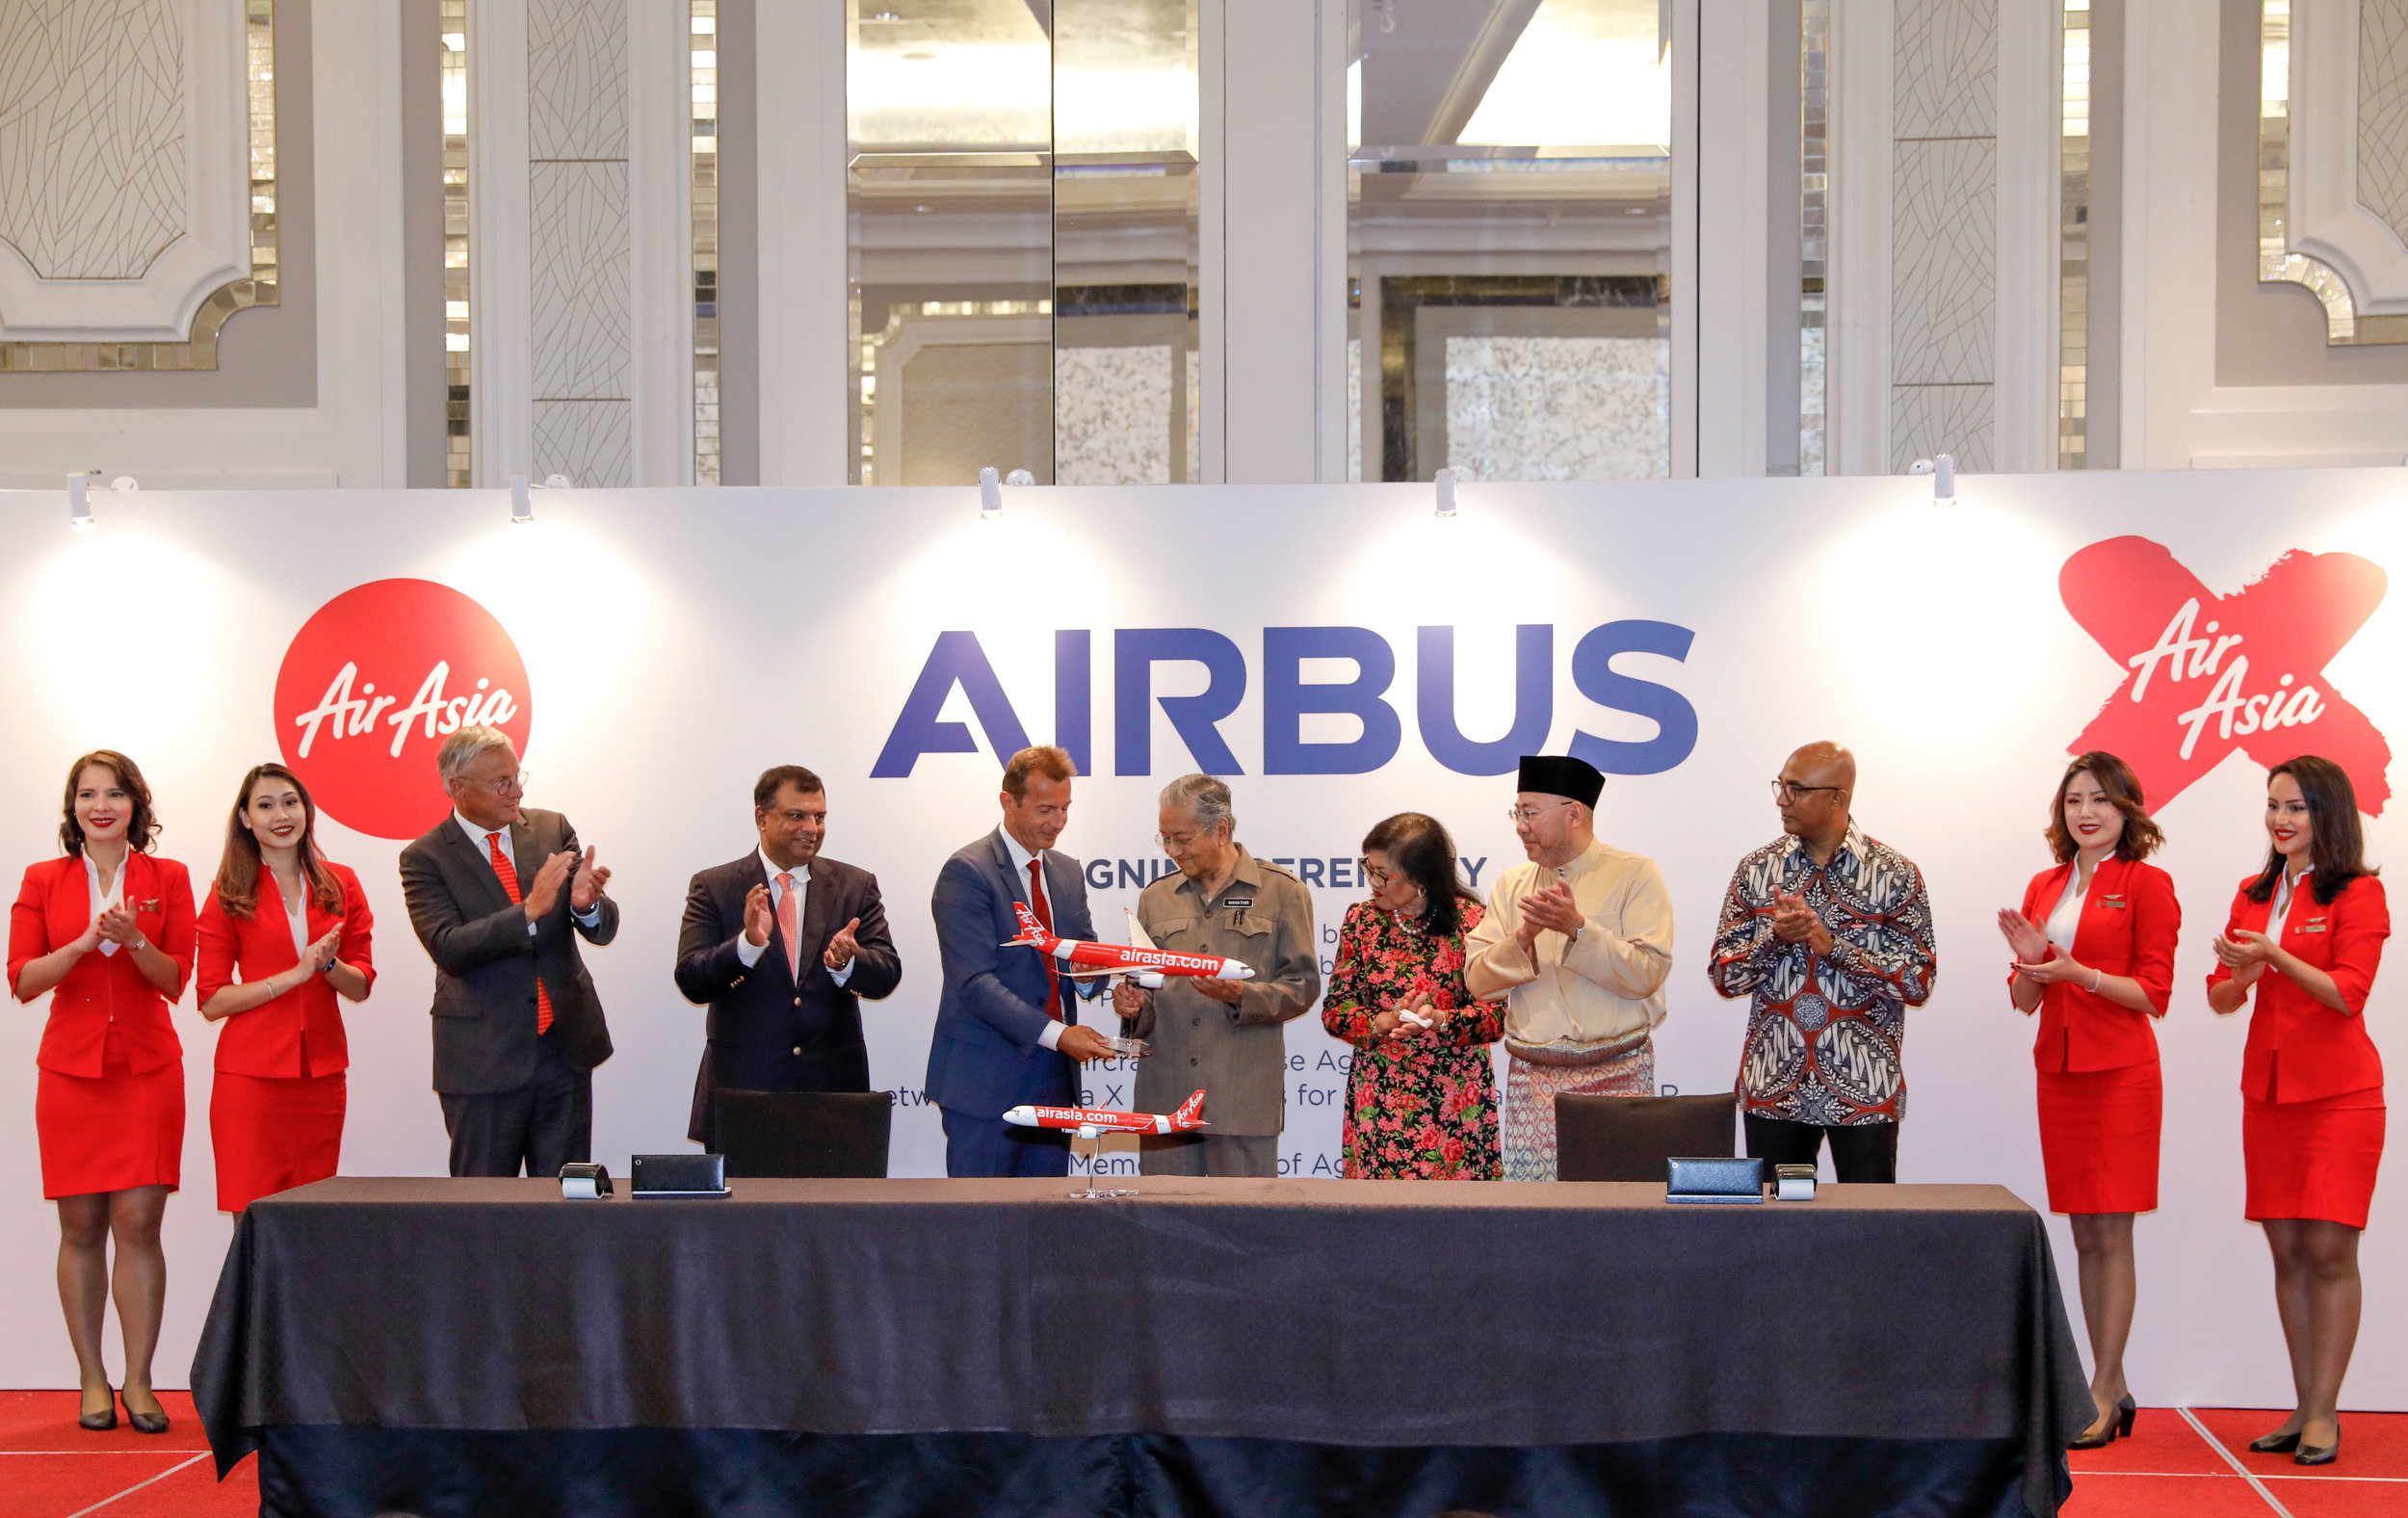 Photo caption (L-R):    Mr Christian Scherer, Airbus Chief Commercial Officer; Tan Sri Tony Fernandes, AirAsia Group CEO; Mr Guillaume Faury, Airbus CEO; YAB Tun Dr Mahathir Bin Mohamad, Prime Minister of Malaysia; Tan Sri Rafidah Aziz, Chairman AirAsia X Berhad; Datuk Kamarudin Meranun, AirAsia Group Executive Chairman; Mr Bo Lingam, AirAsia Group President (Airlines) flanked by cabin crew.